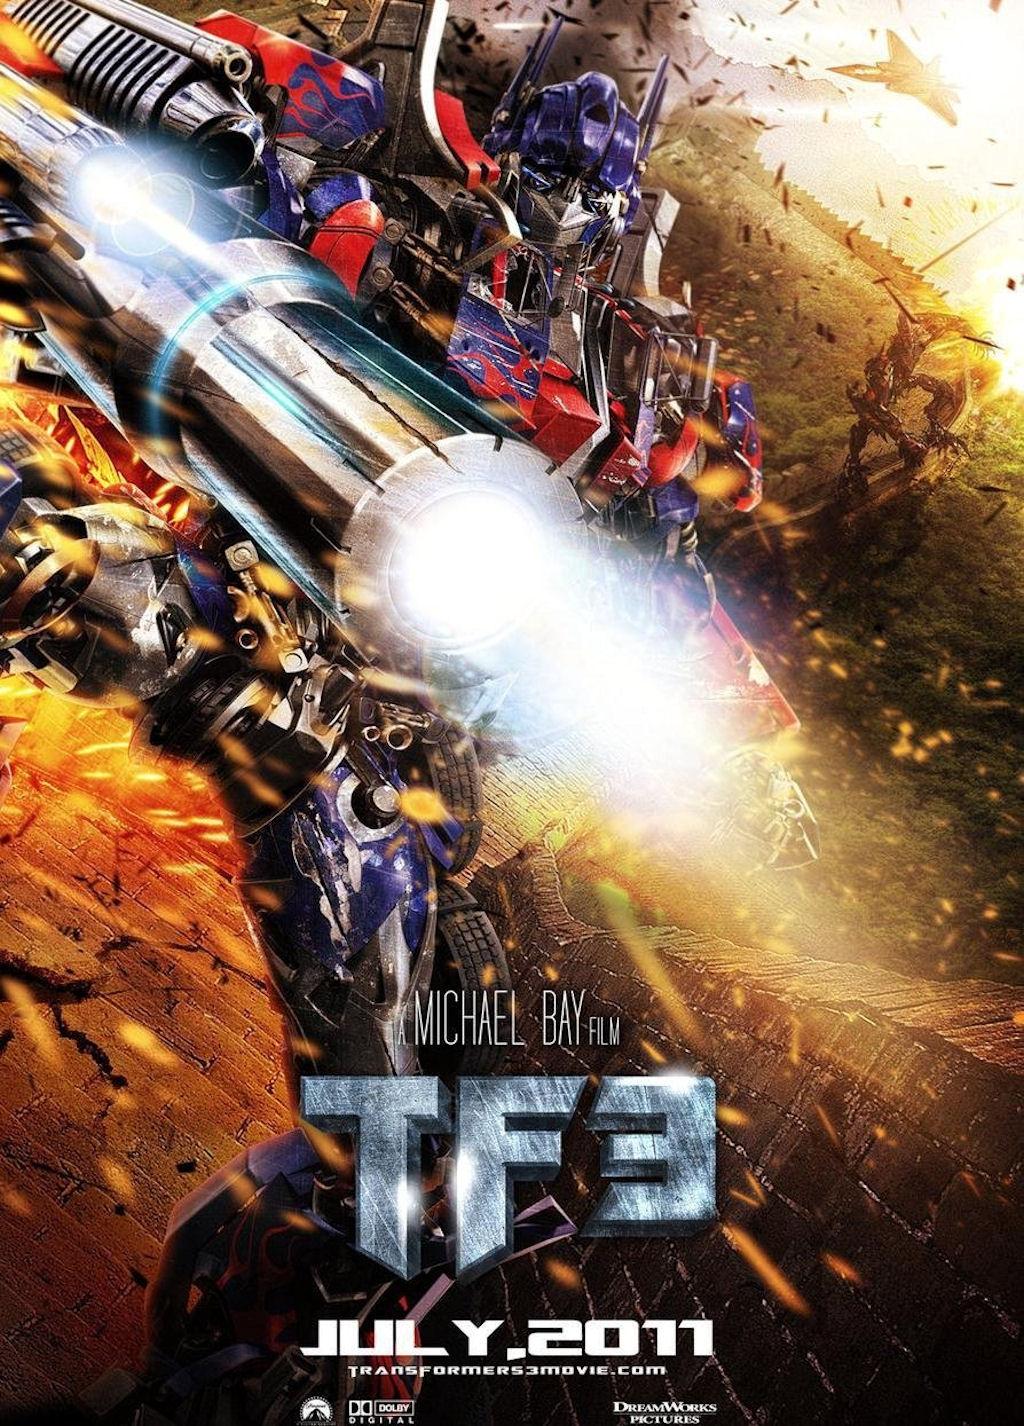 Transformers 3 Dark of the Moon ทรานส์ฟอร์เมอร์ ภาค 3 [HD][พากย์ไทย]